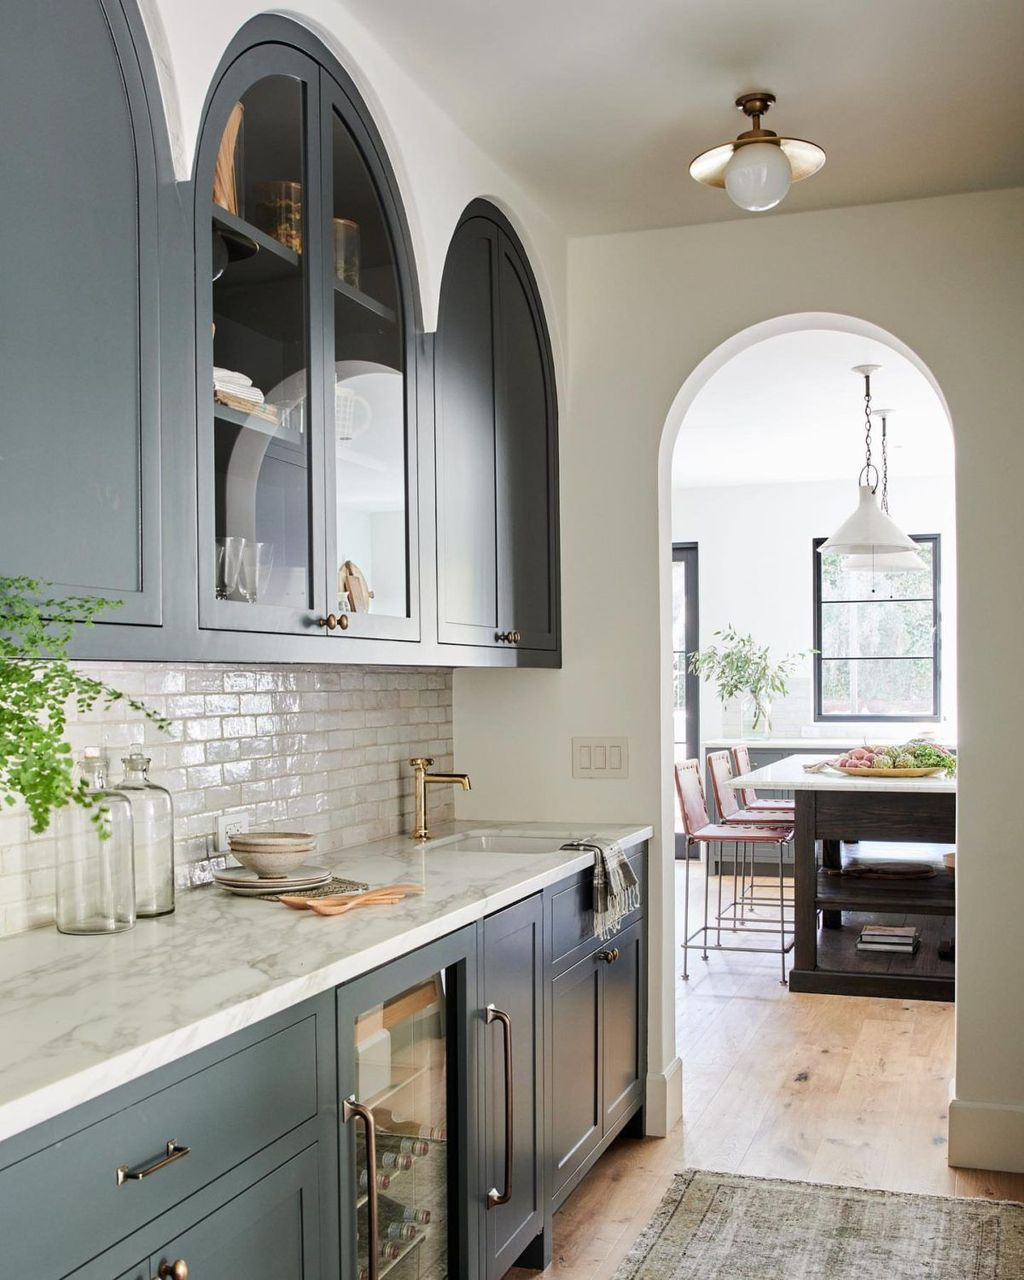 Stunning Farmhouse Interior Design Ideas To Realize Your Dreams 08